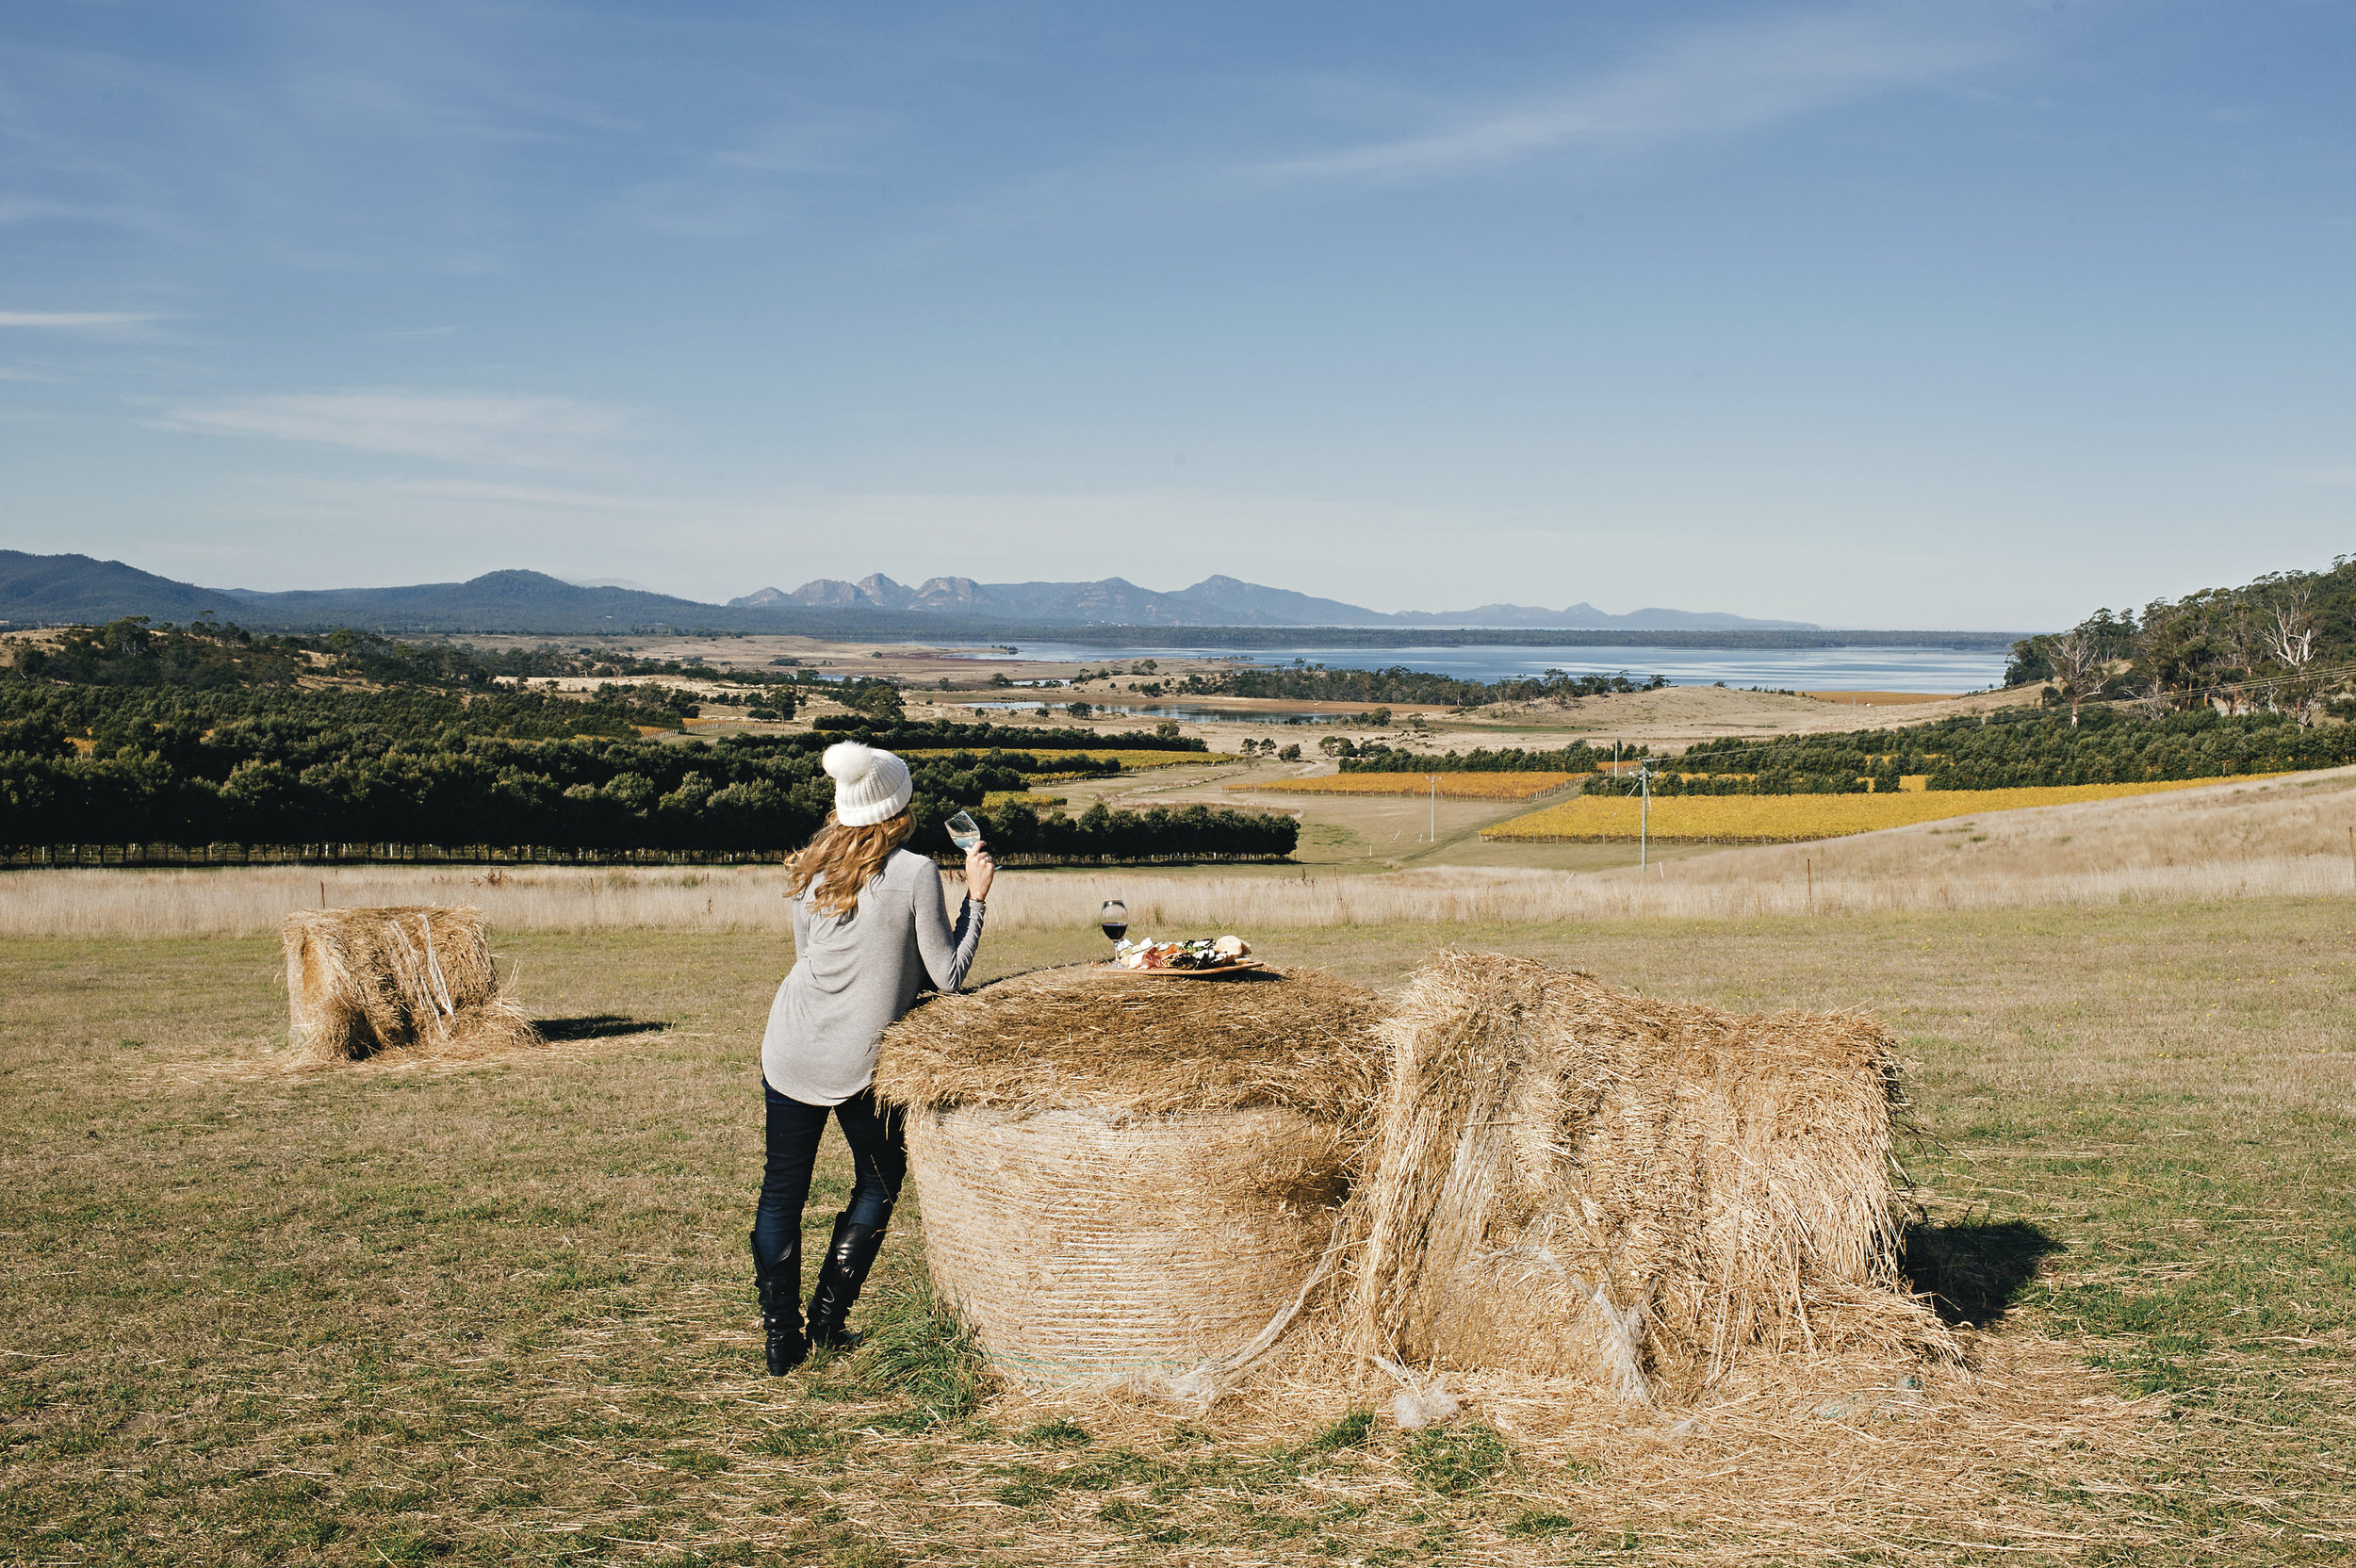 Devil's Corner Cellar Door - a vineyard on the East Coast of Tasmania with an impressive view even by Tasmania's standards.